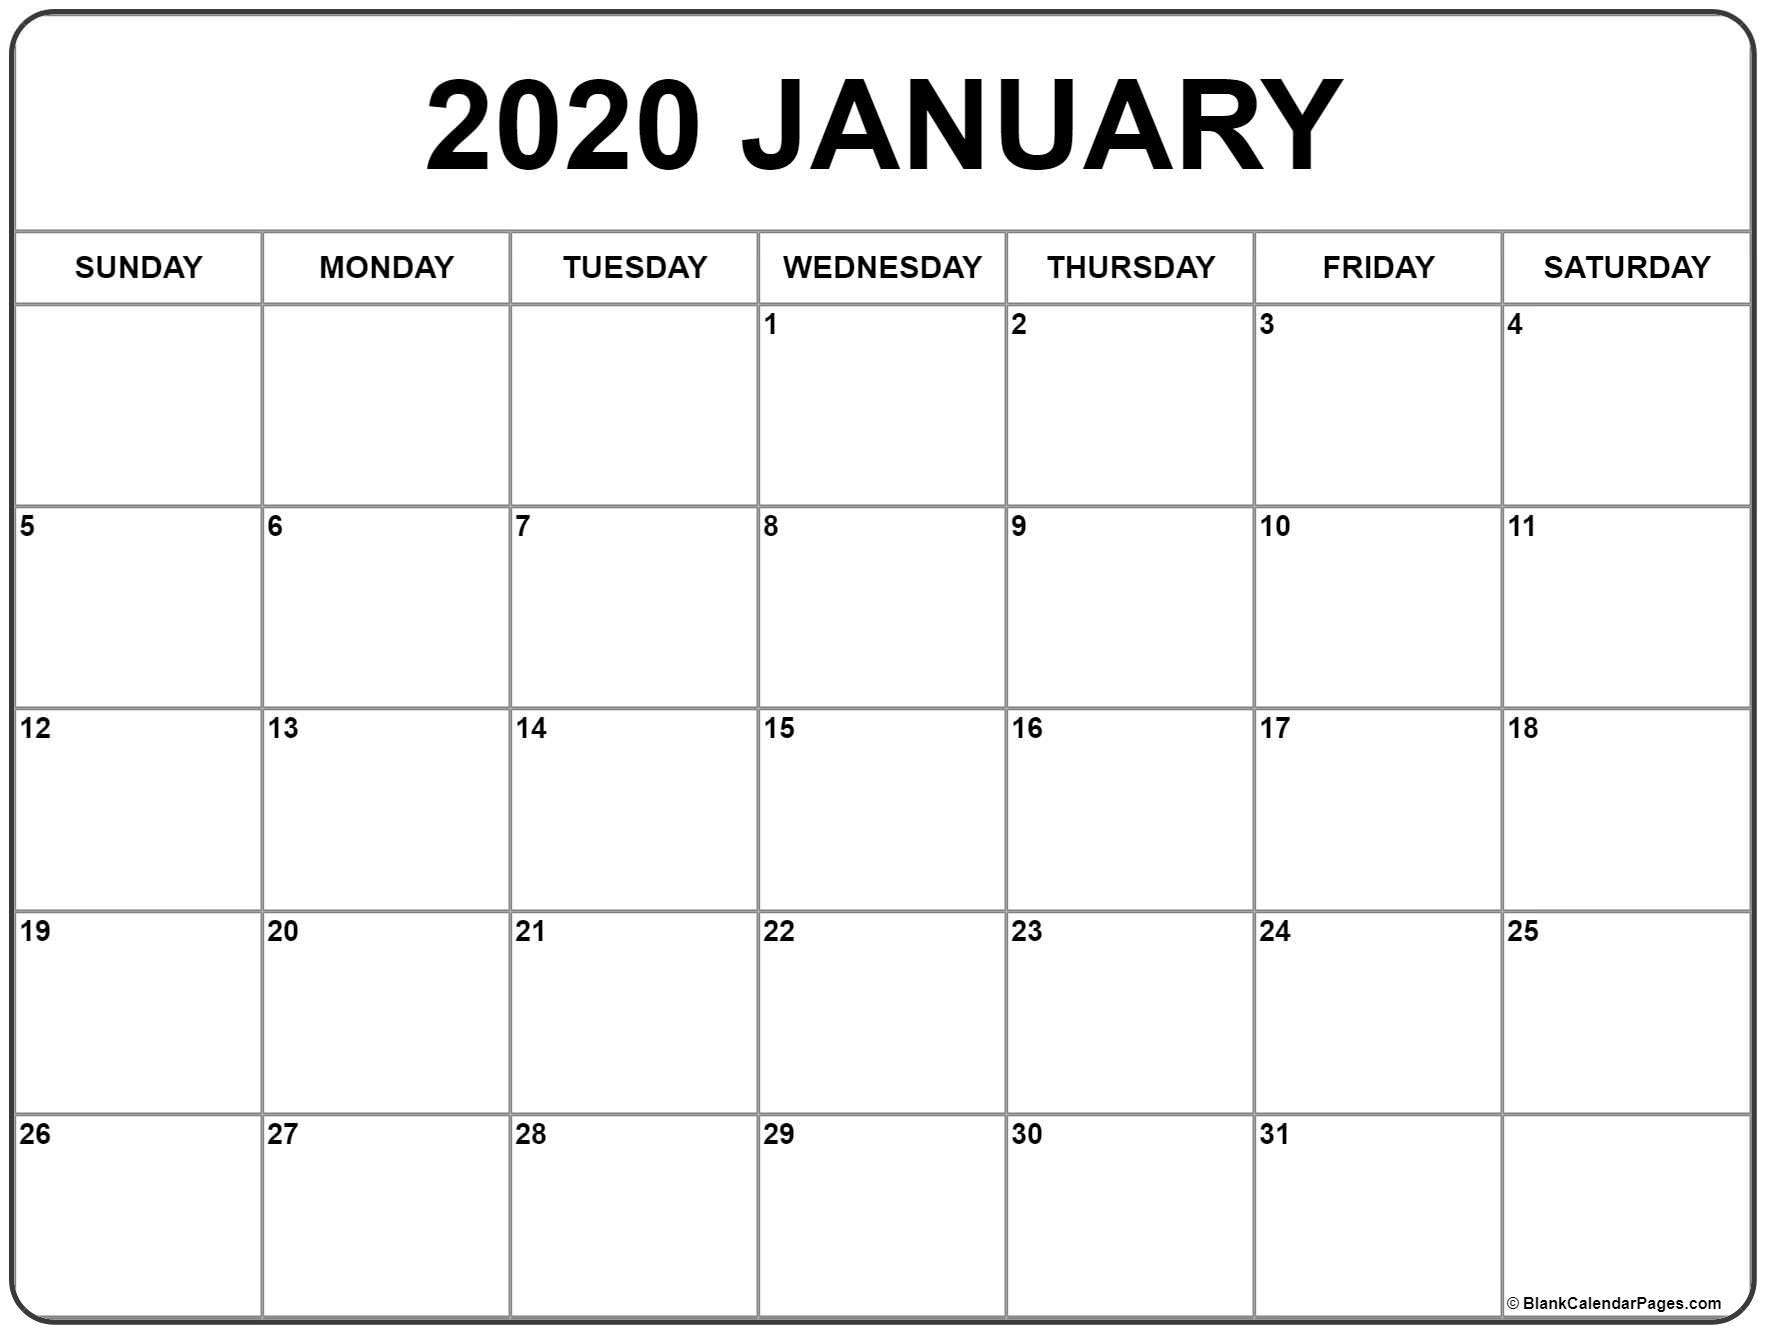 January 2020 Calendar   Free Printable Monthly Calendars within Large Blank Monthly Calendars January Printable